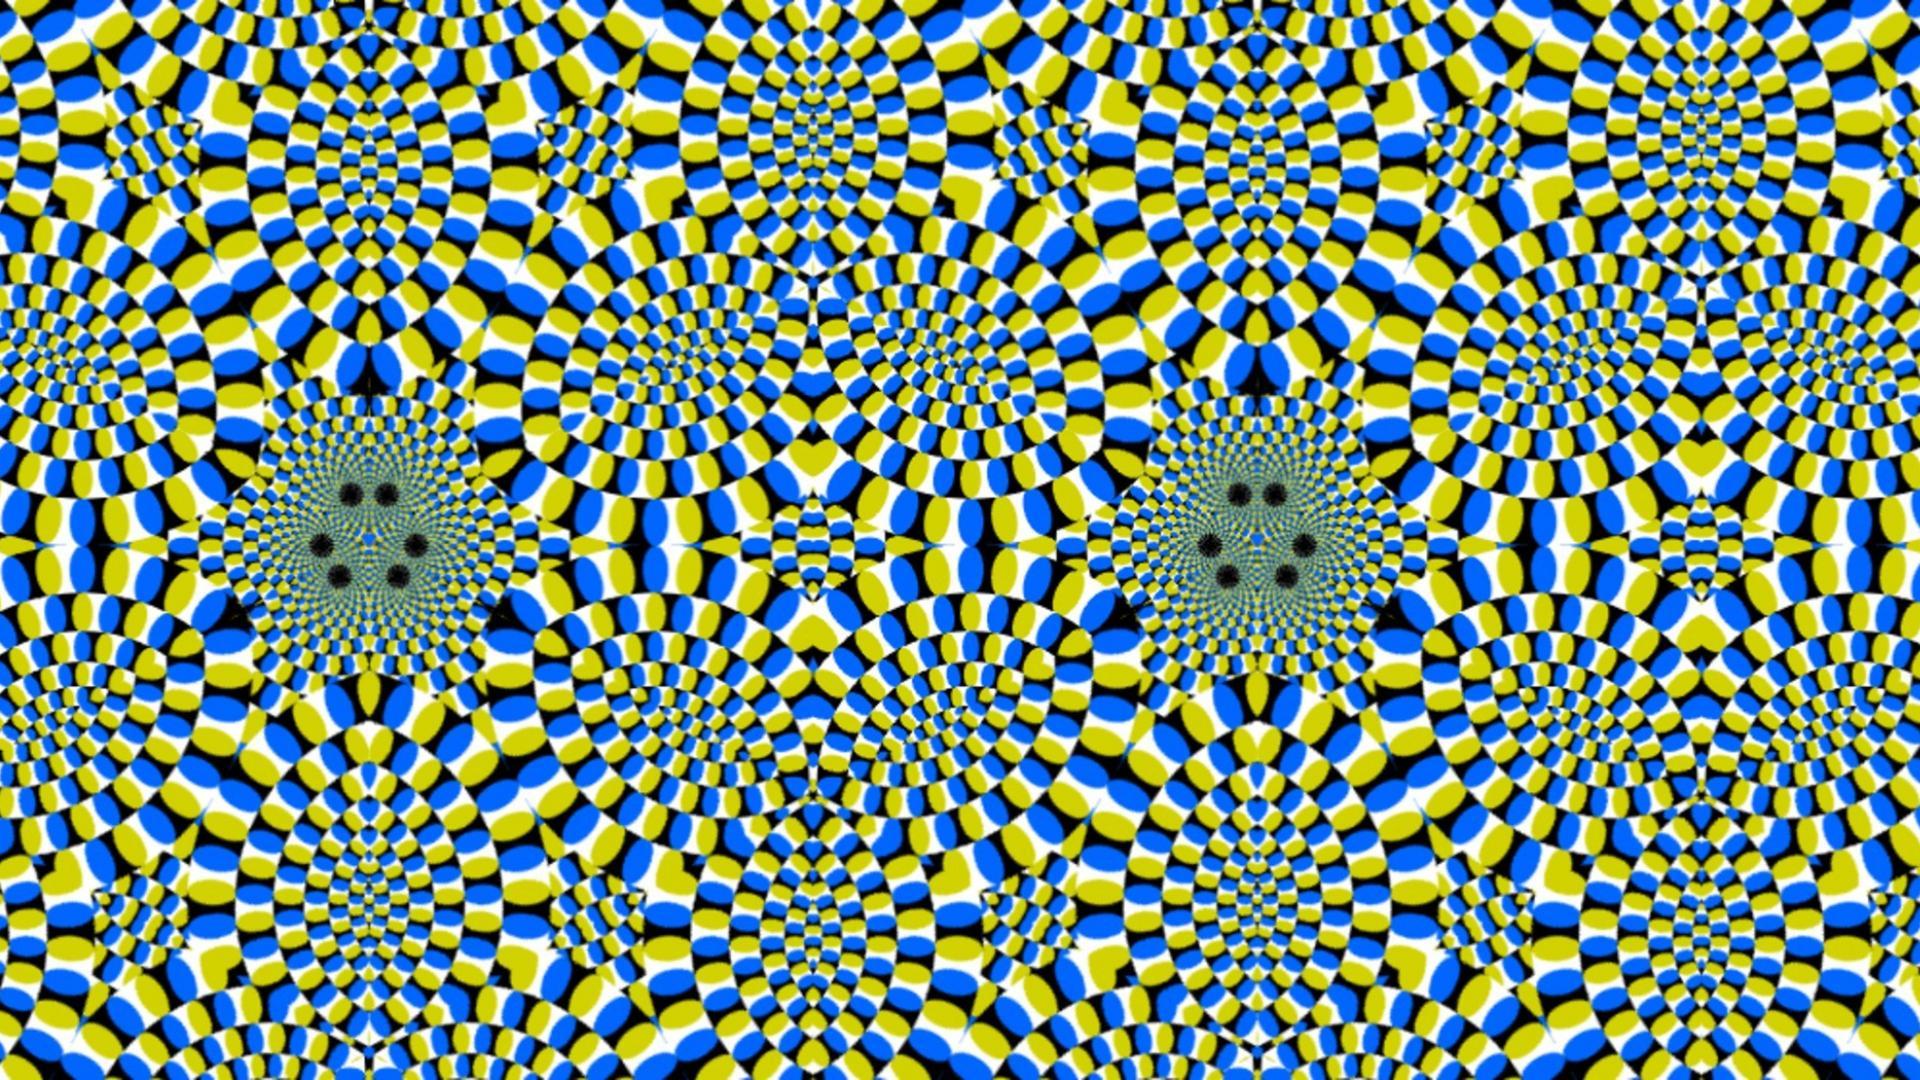 Optical Illusion Backgrounds  WallpaperSafari